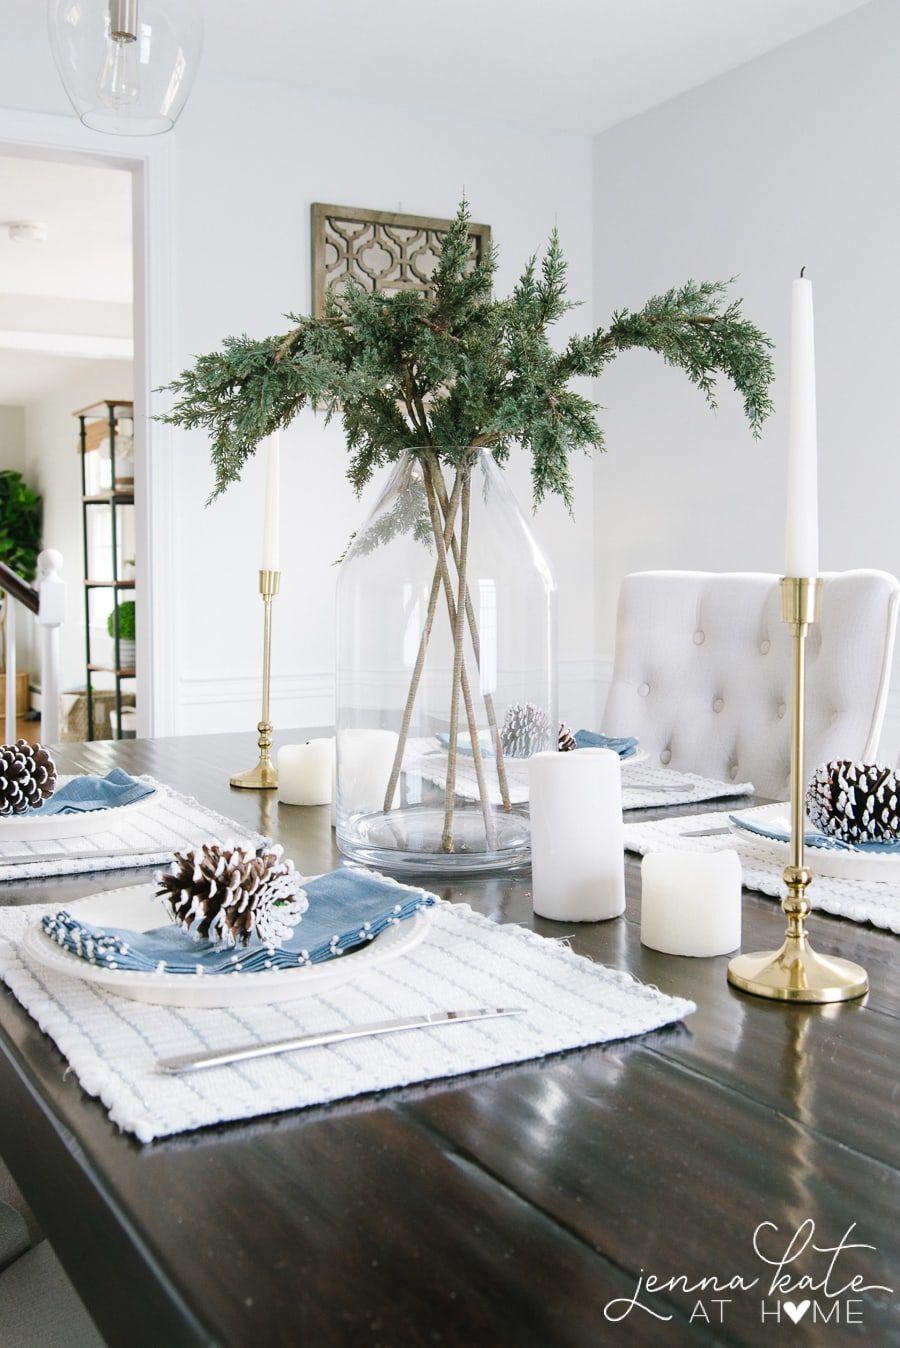 Simple Winter Table Decor Ideas Decor Winter Table Table Decorations